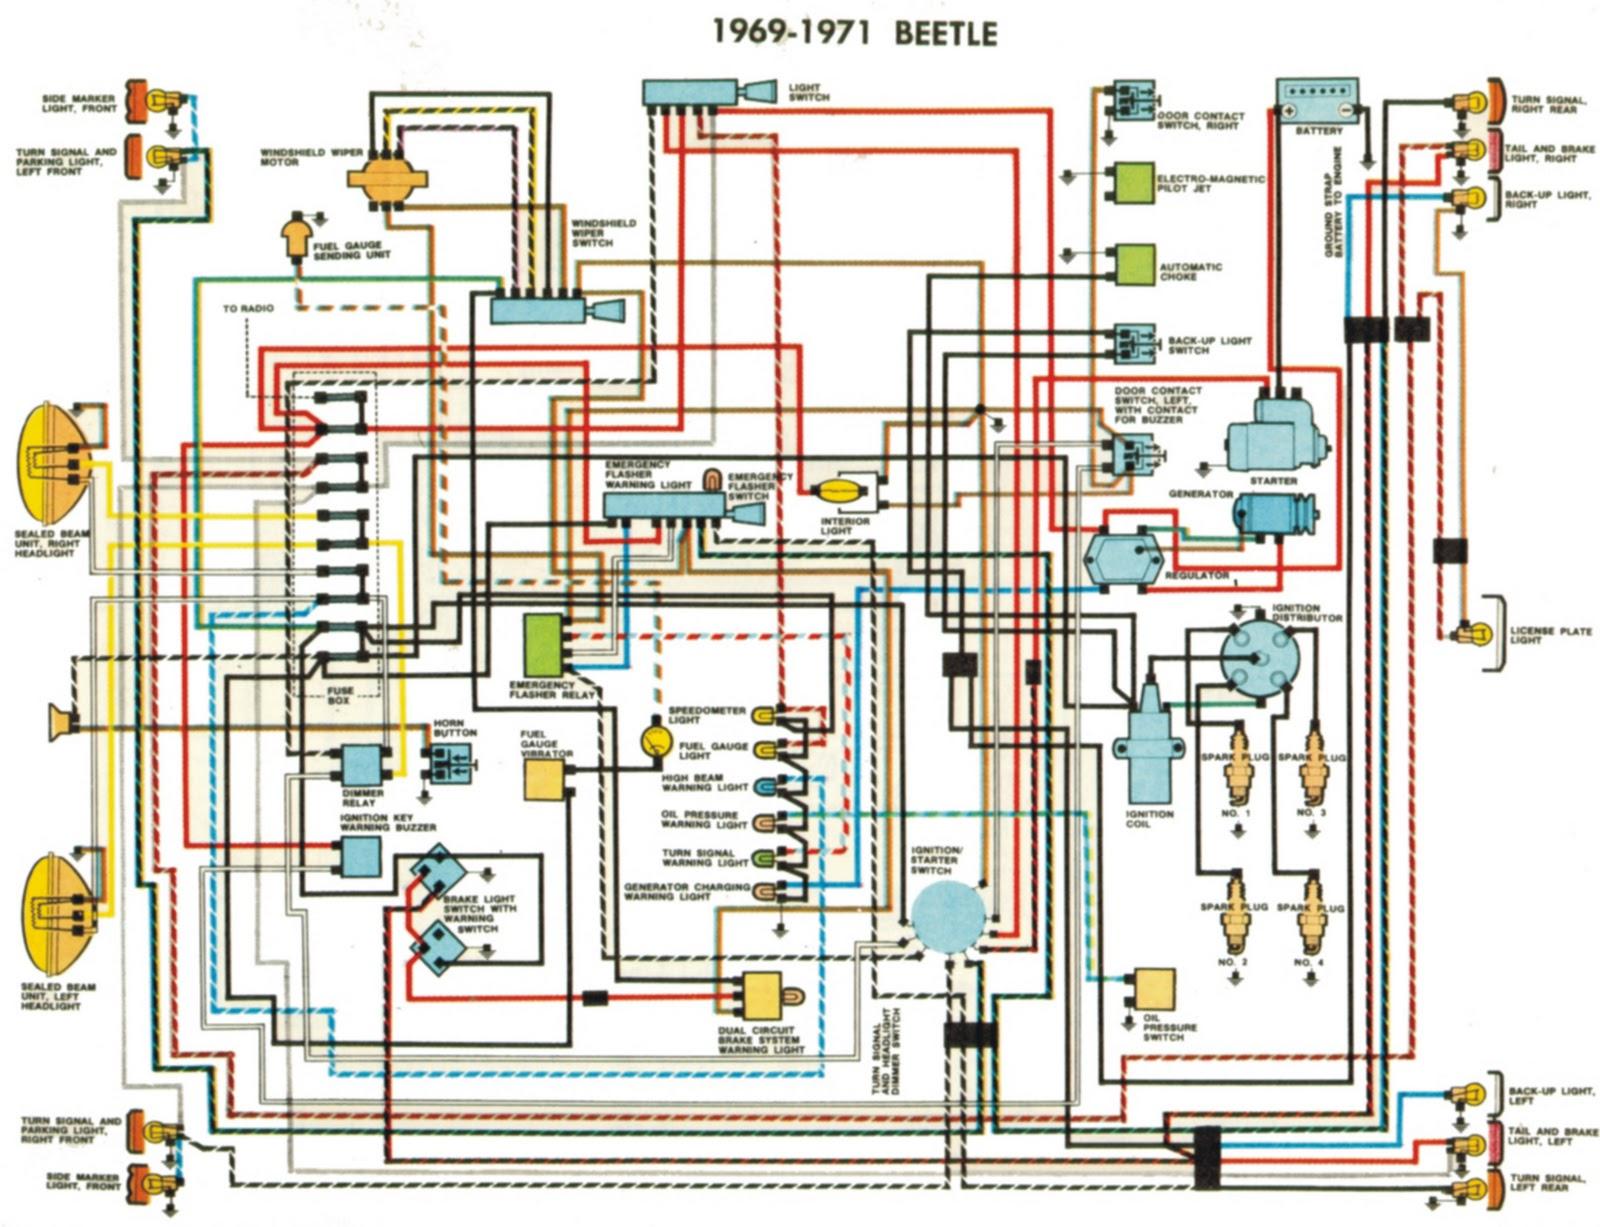 Surprising 72 Vw Wiring Harness Wiring Diagram Data Wiring Cloud Grayisramohammedshrineorg